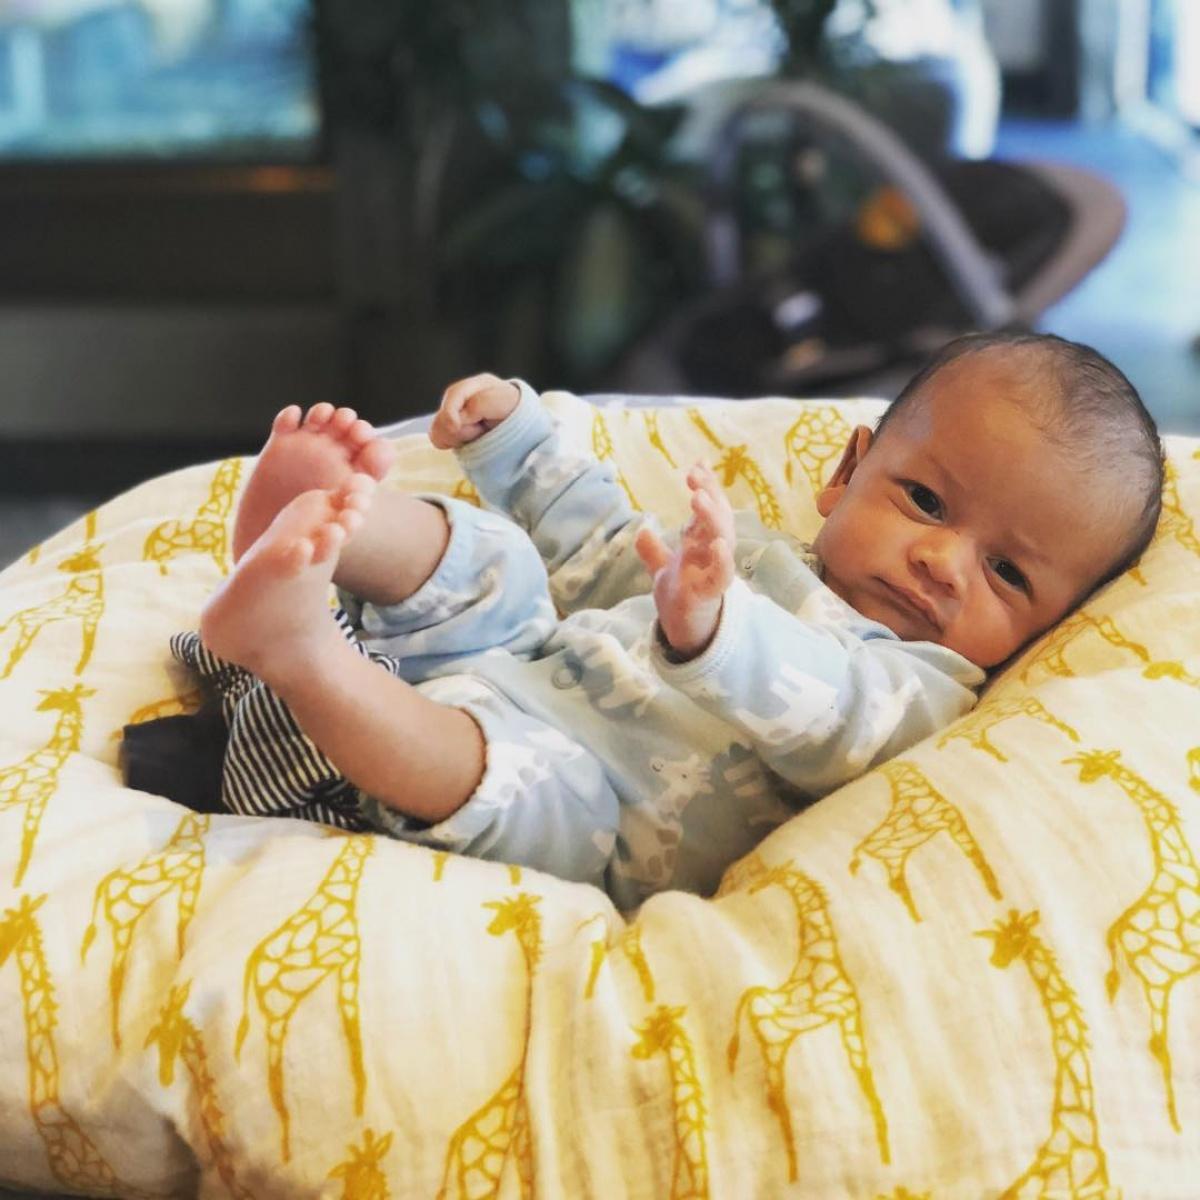 Chrissy Teigen Shares Details Of Her IVF Journey And New